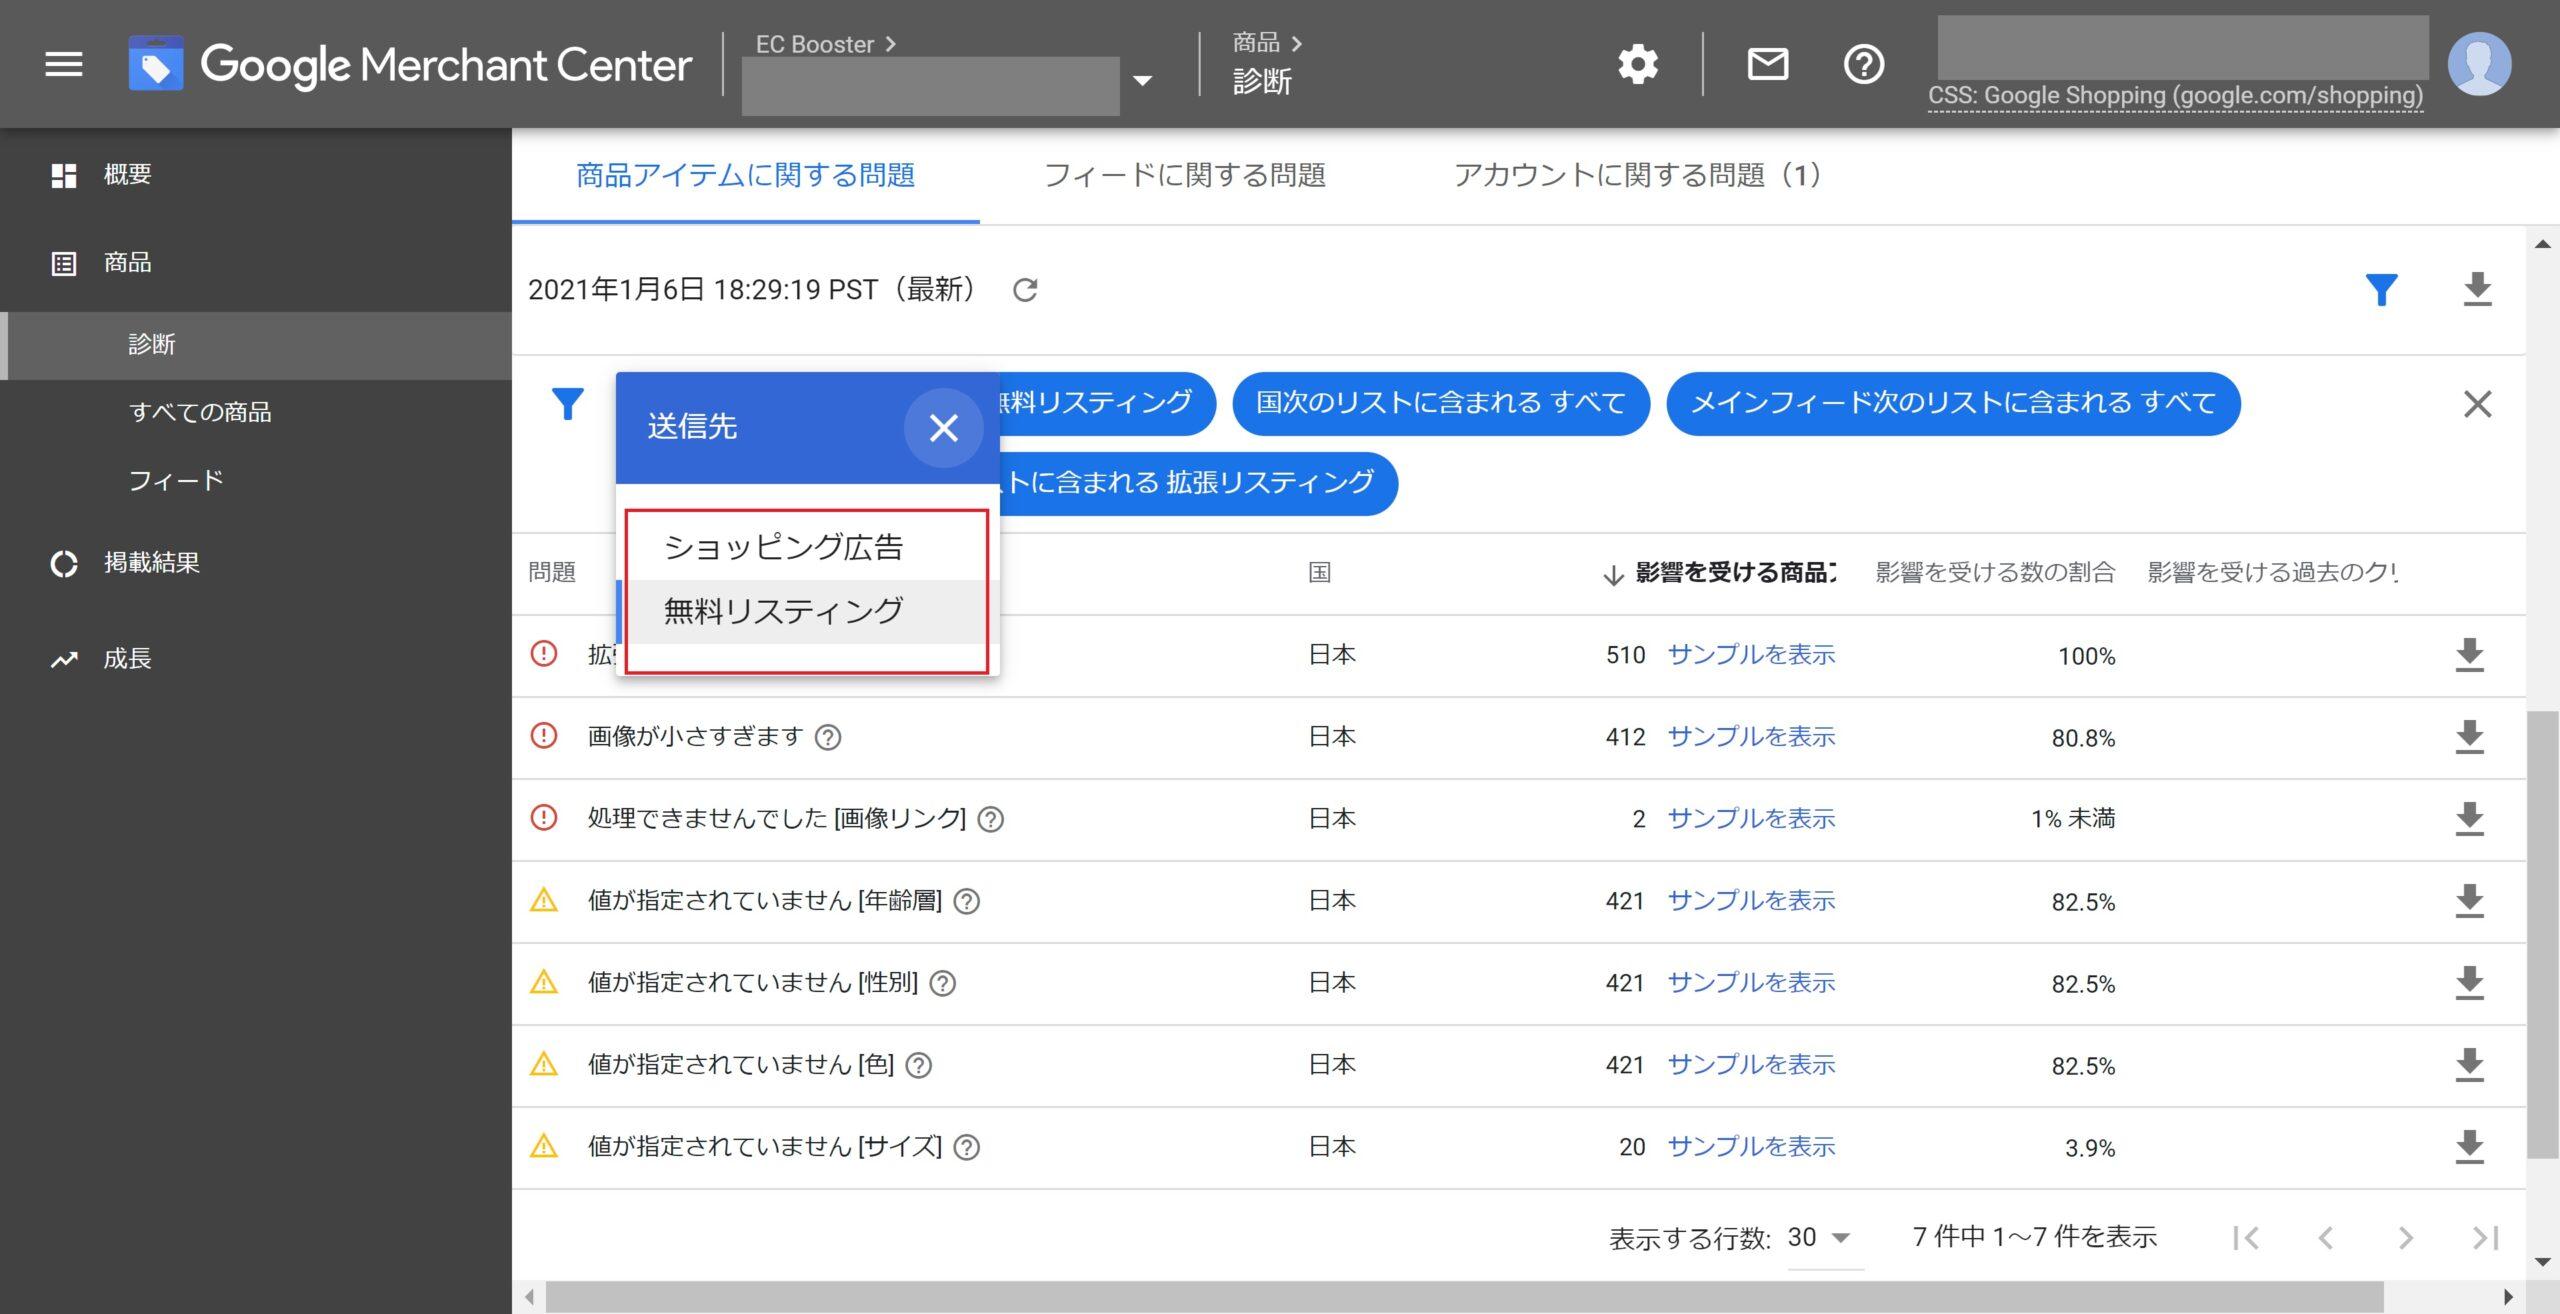 free-product-listings-google-merchant-center-dashboard-menu